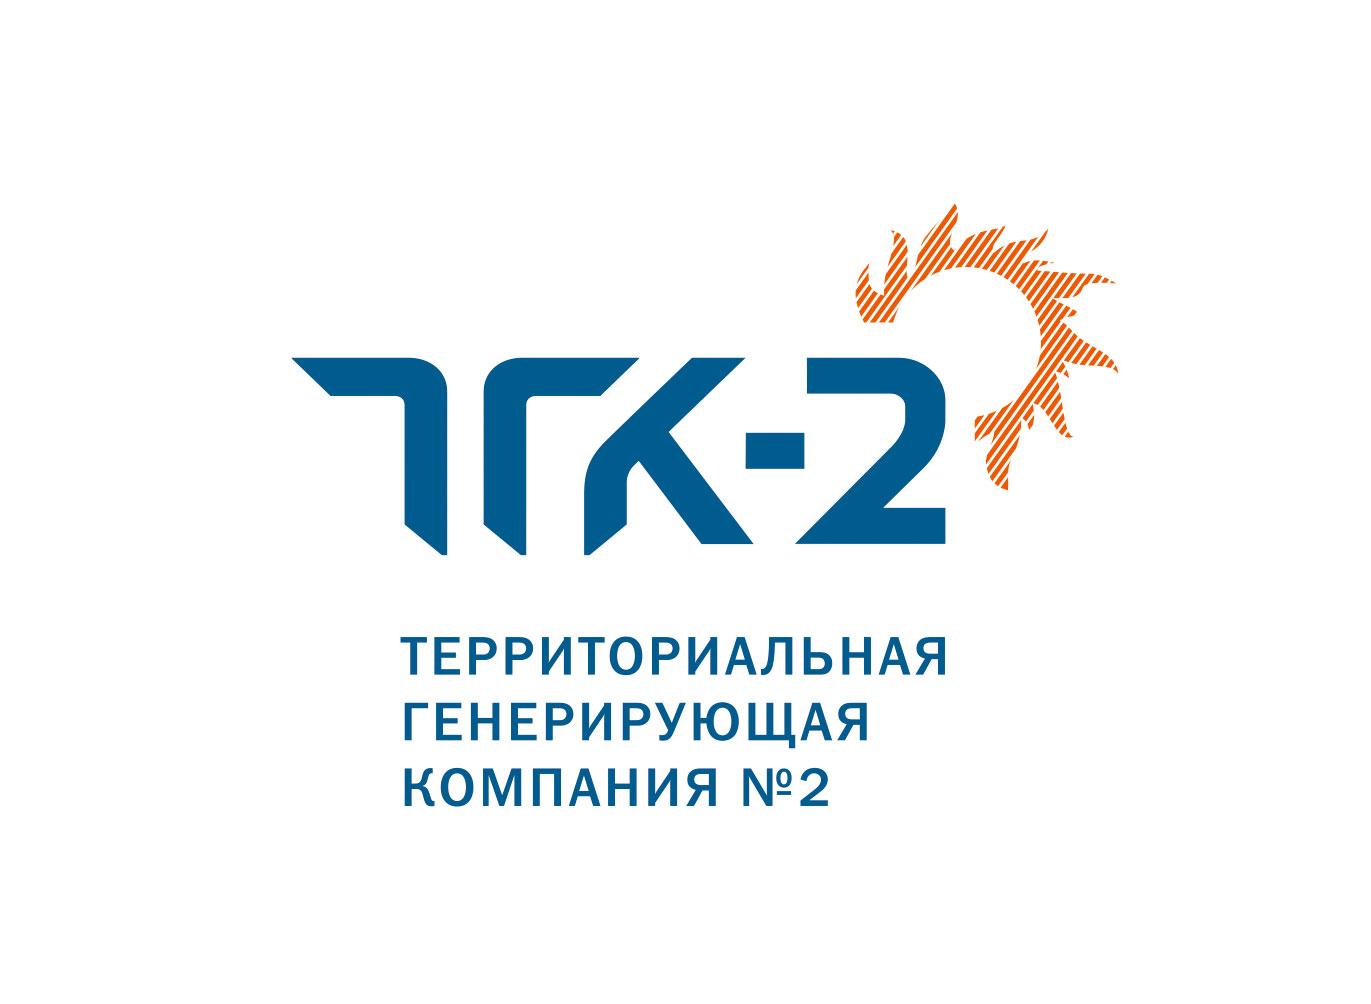 Логотип ТГК-2